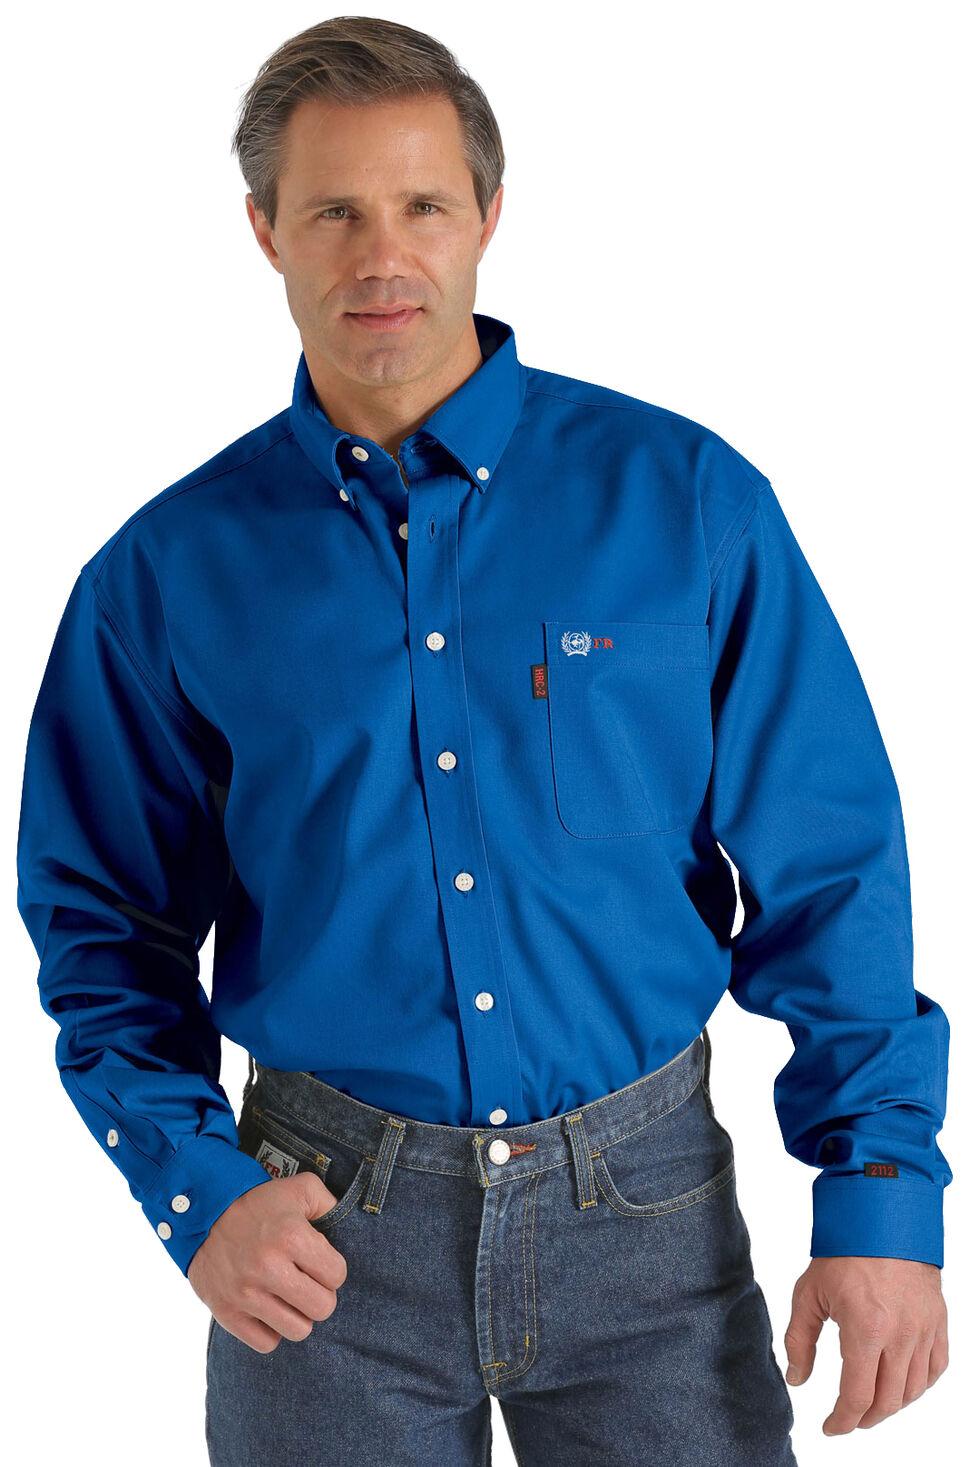 Cinch WRX Flame-Resistant Solid Royal Blue Shirt, Royal, hi-res